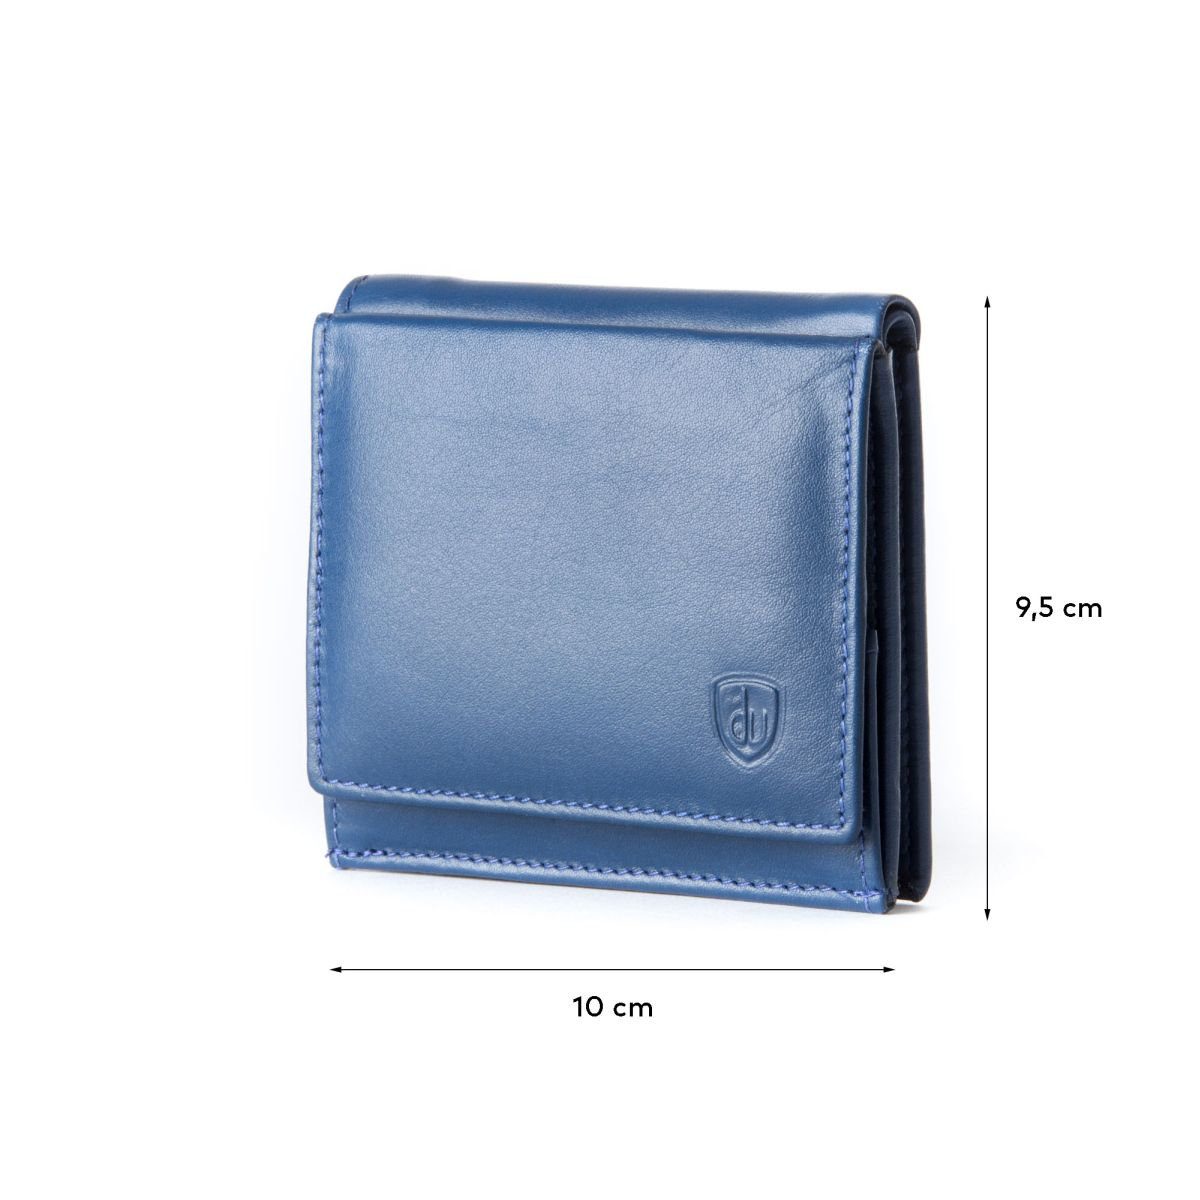 dv ארנק עור אלגנטי עם תא ייחודי למטבעות - כחול